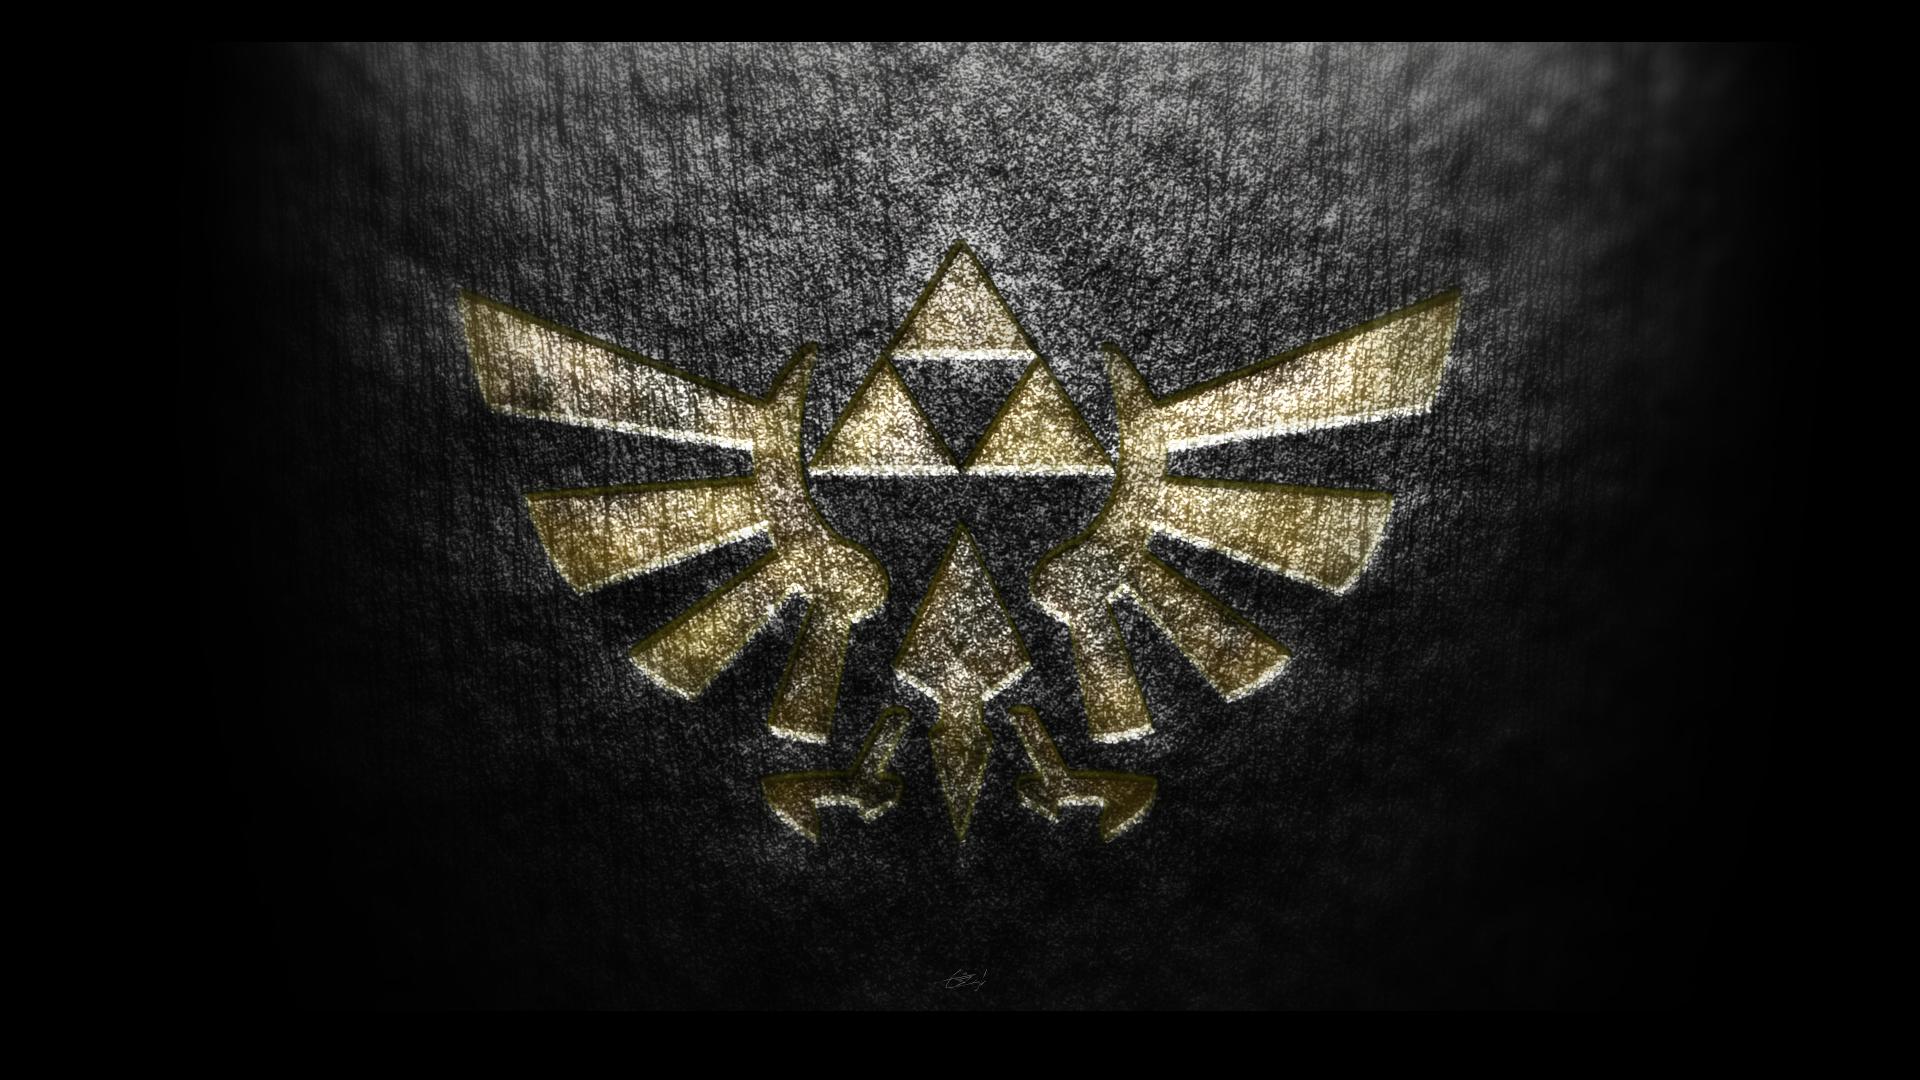 Wallpaper Abyss Explore the Collection Zelda Video Game Zelda 167569 1920x1080